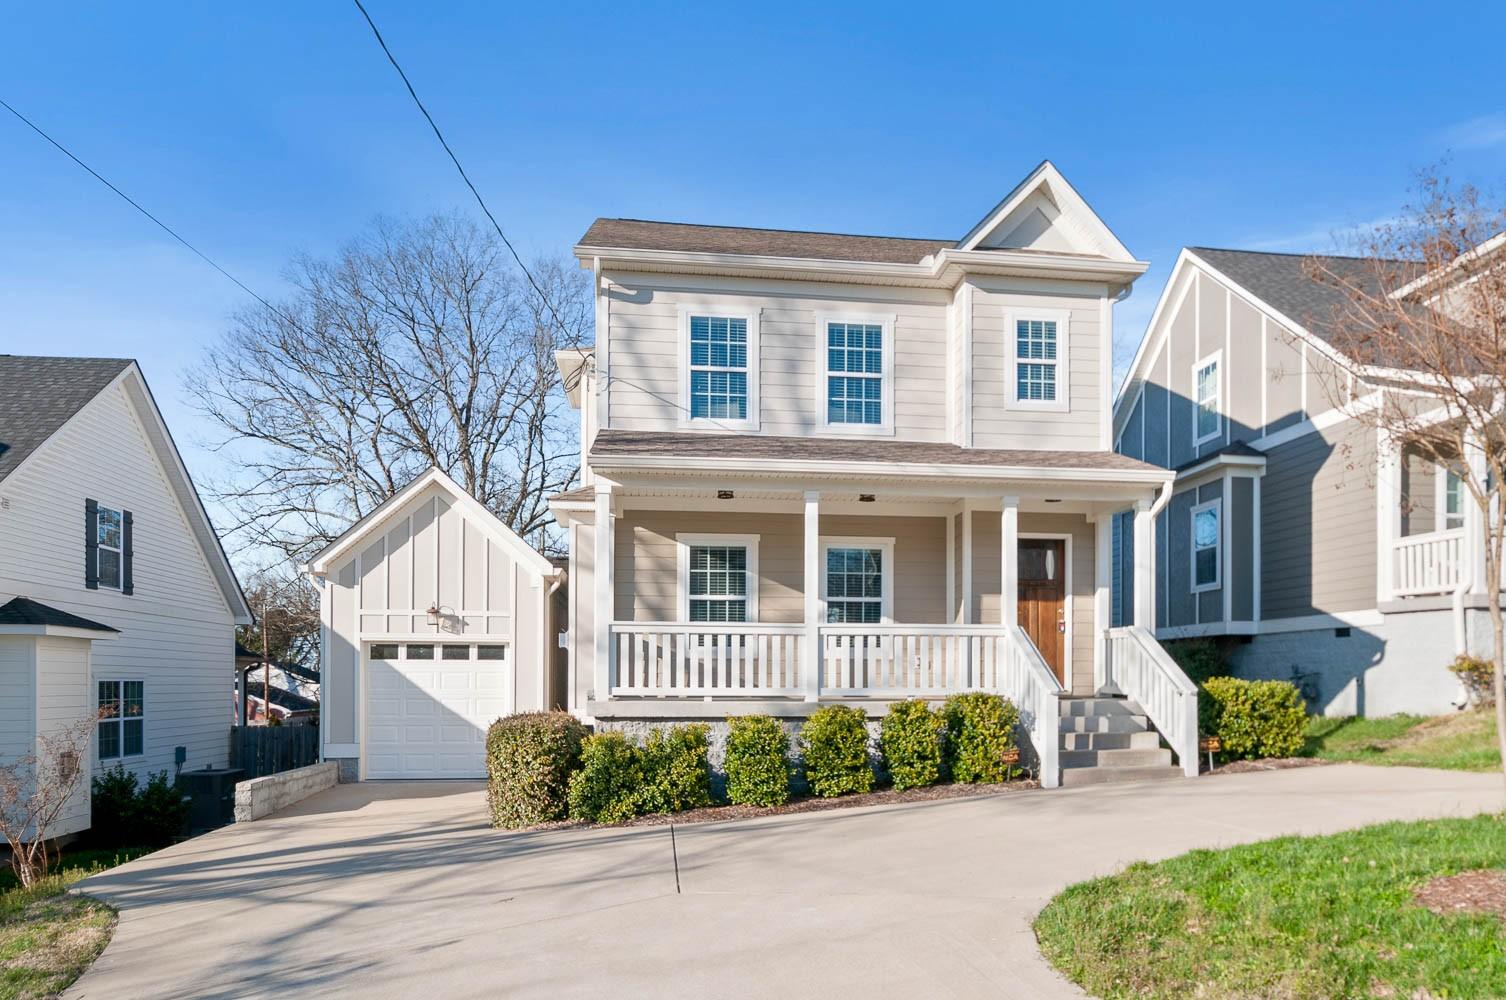 502B Patterson St, Nashville, TN 37211 - Nashville, TN real estate listing